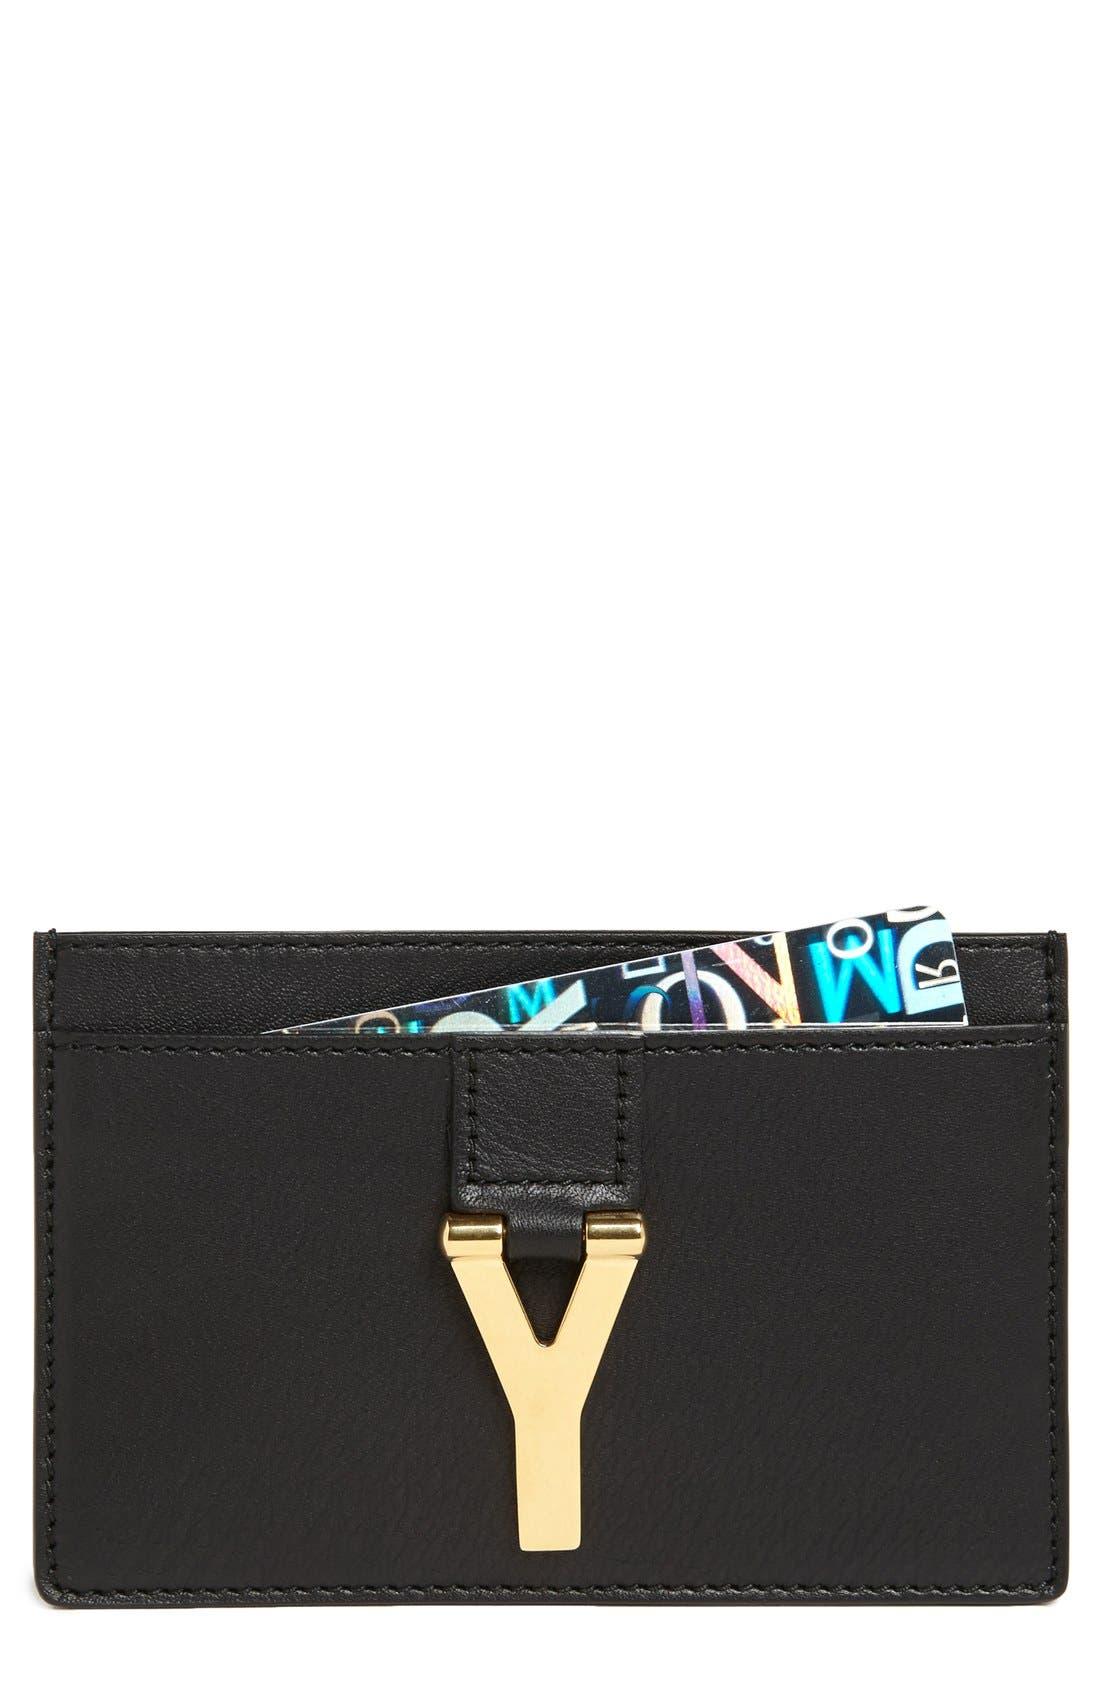 Alternate Image 1 Selected - Saint Laurent Leather Credit Card Case